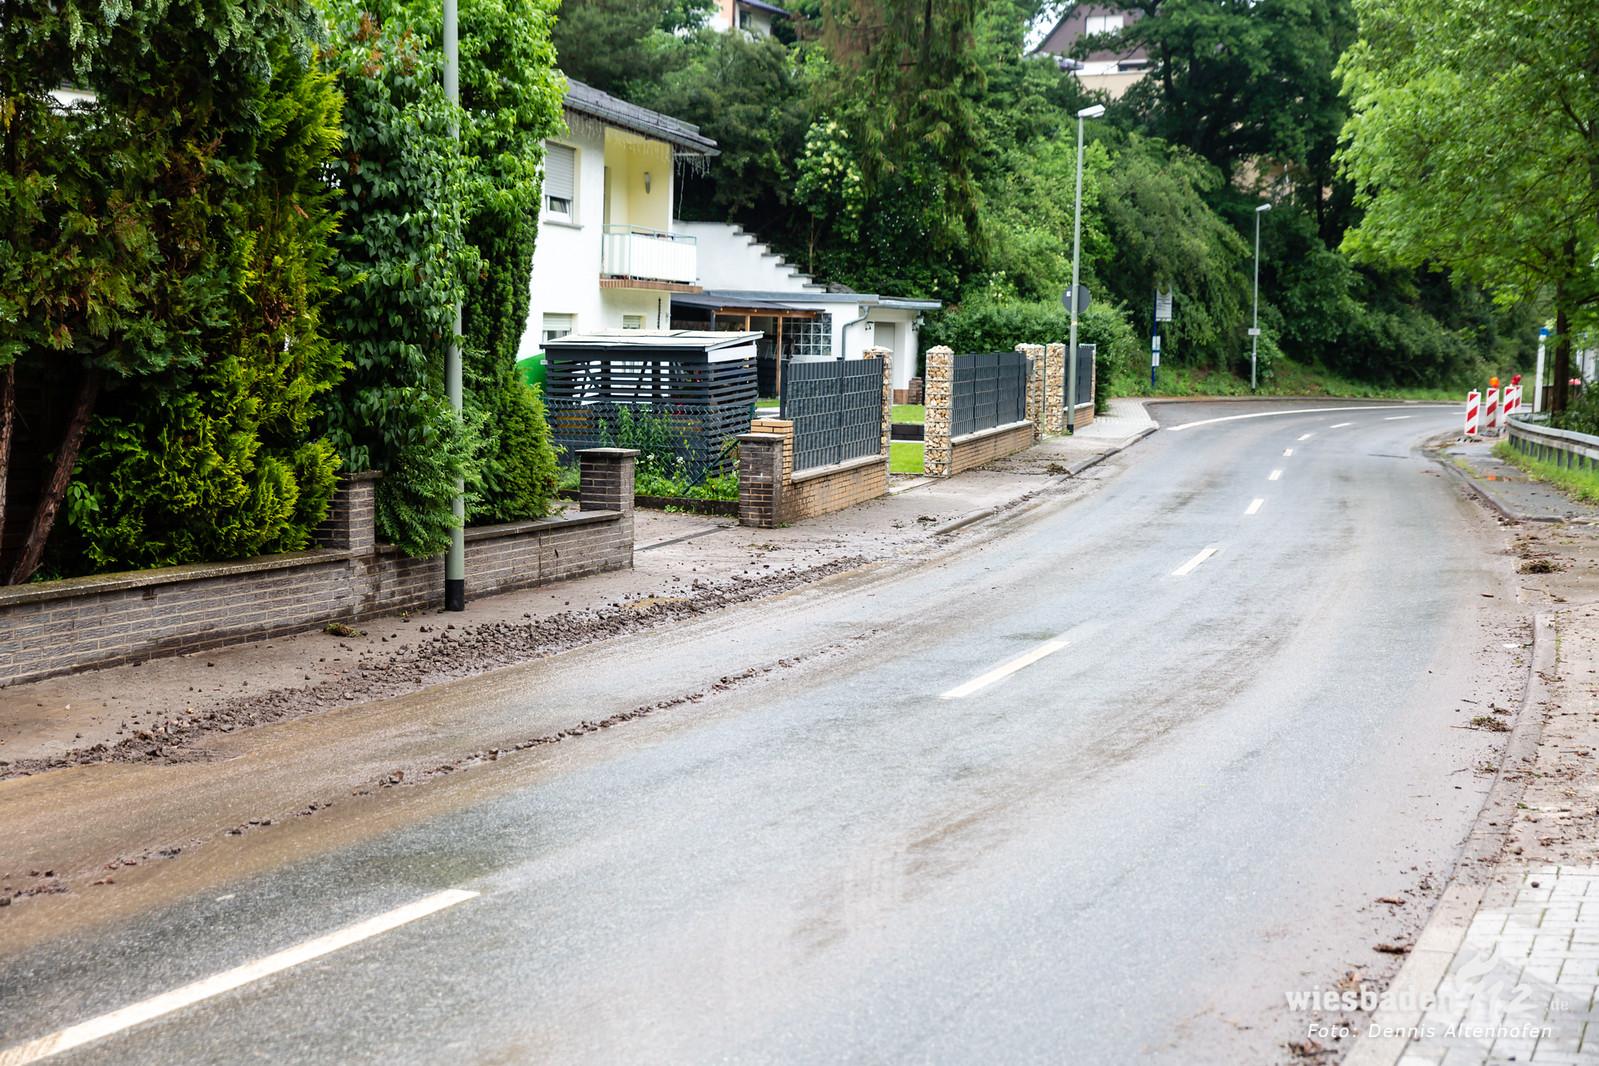 Unwetter in Bad Schwalbach 03.06.19